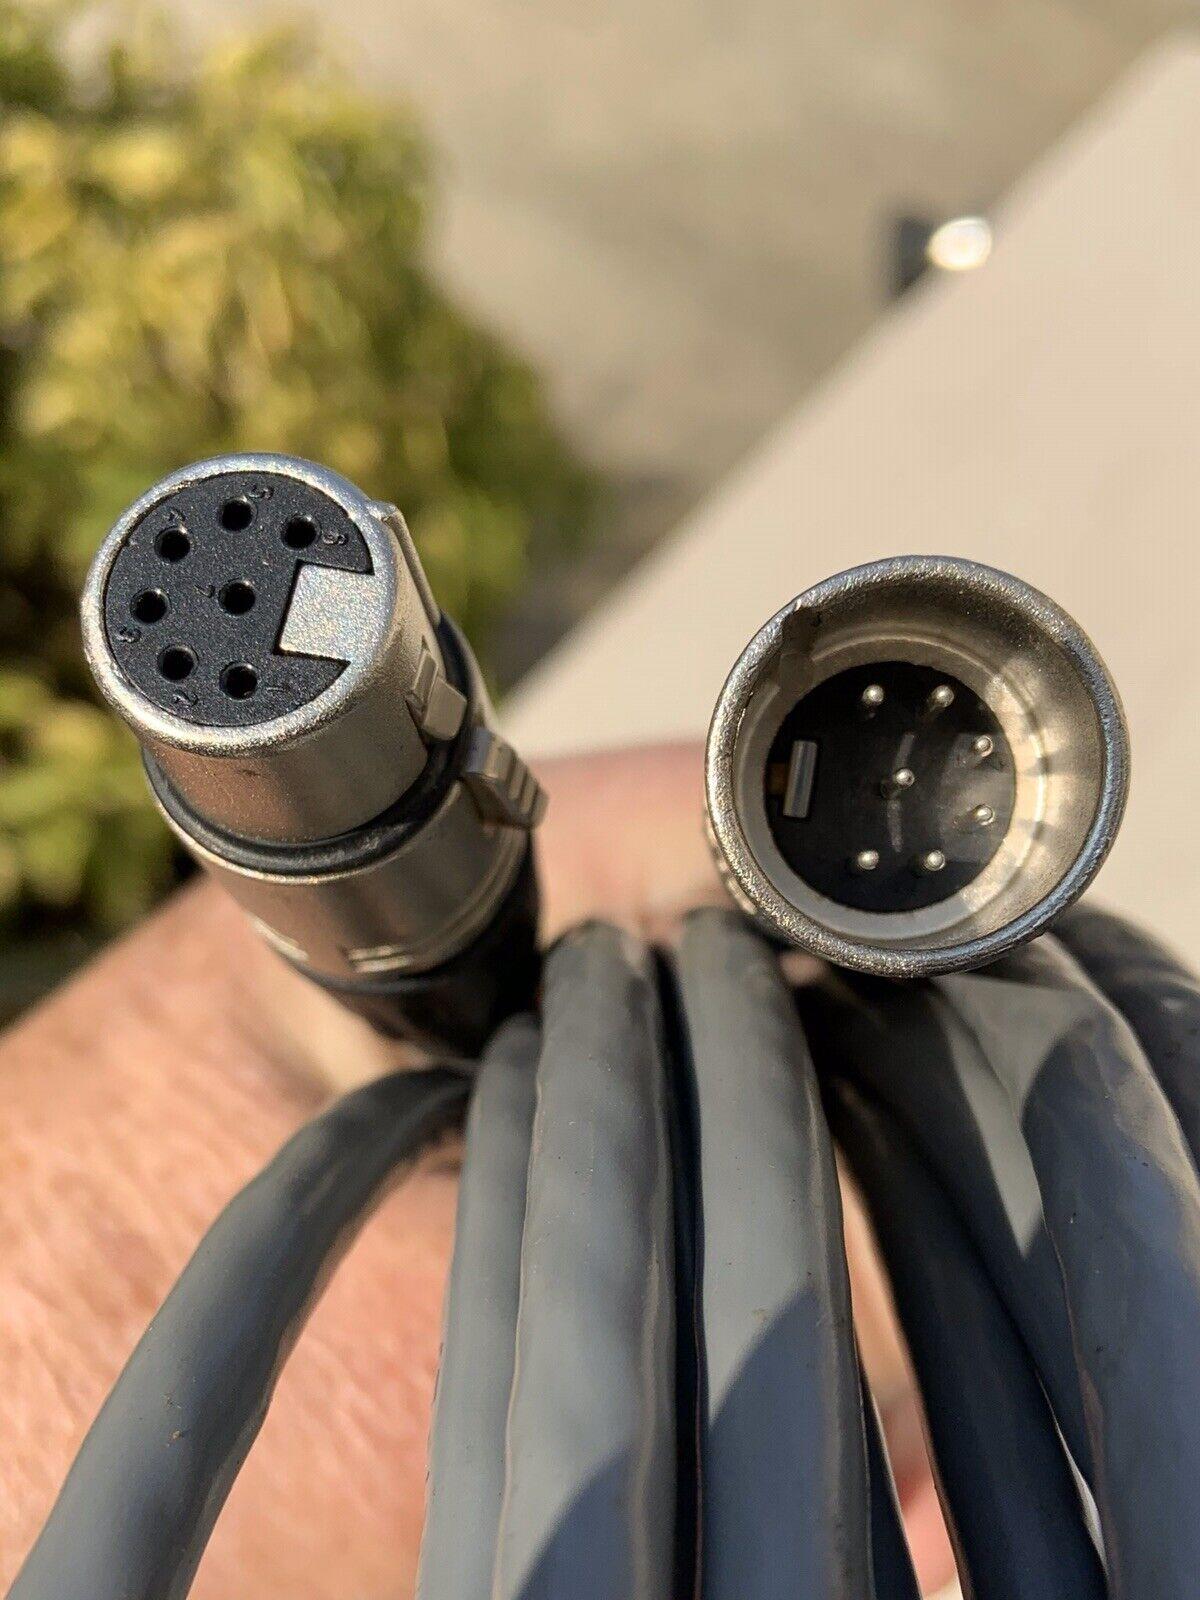 7 Pin XLR Cable - 25'